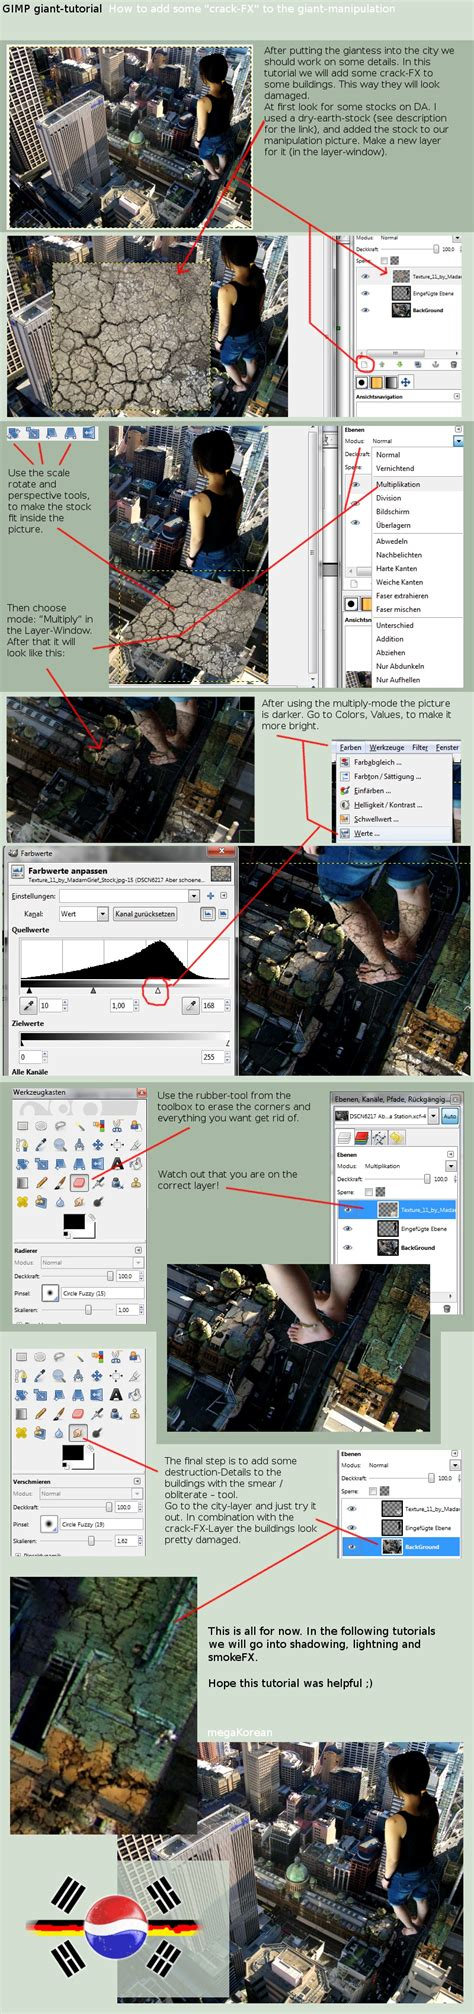 tutorial gimp video gimp giant manip tutorial 02 by megakorean on deviantart